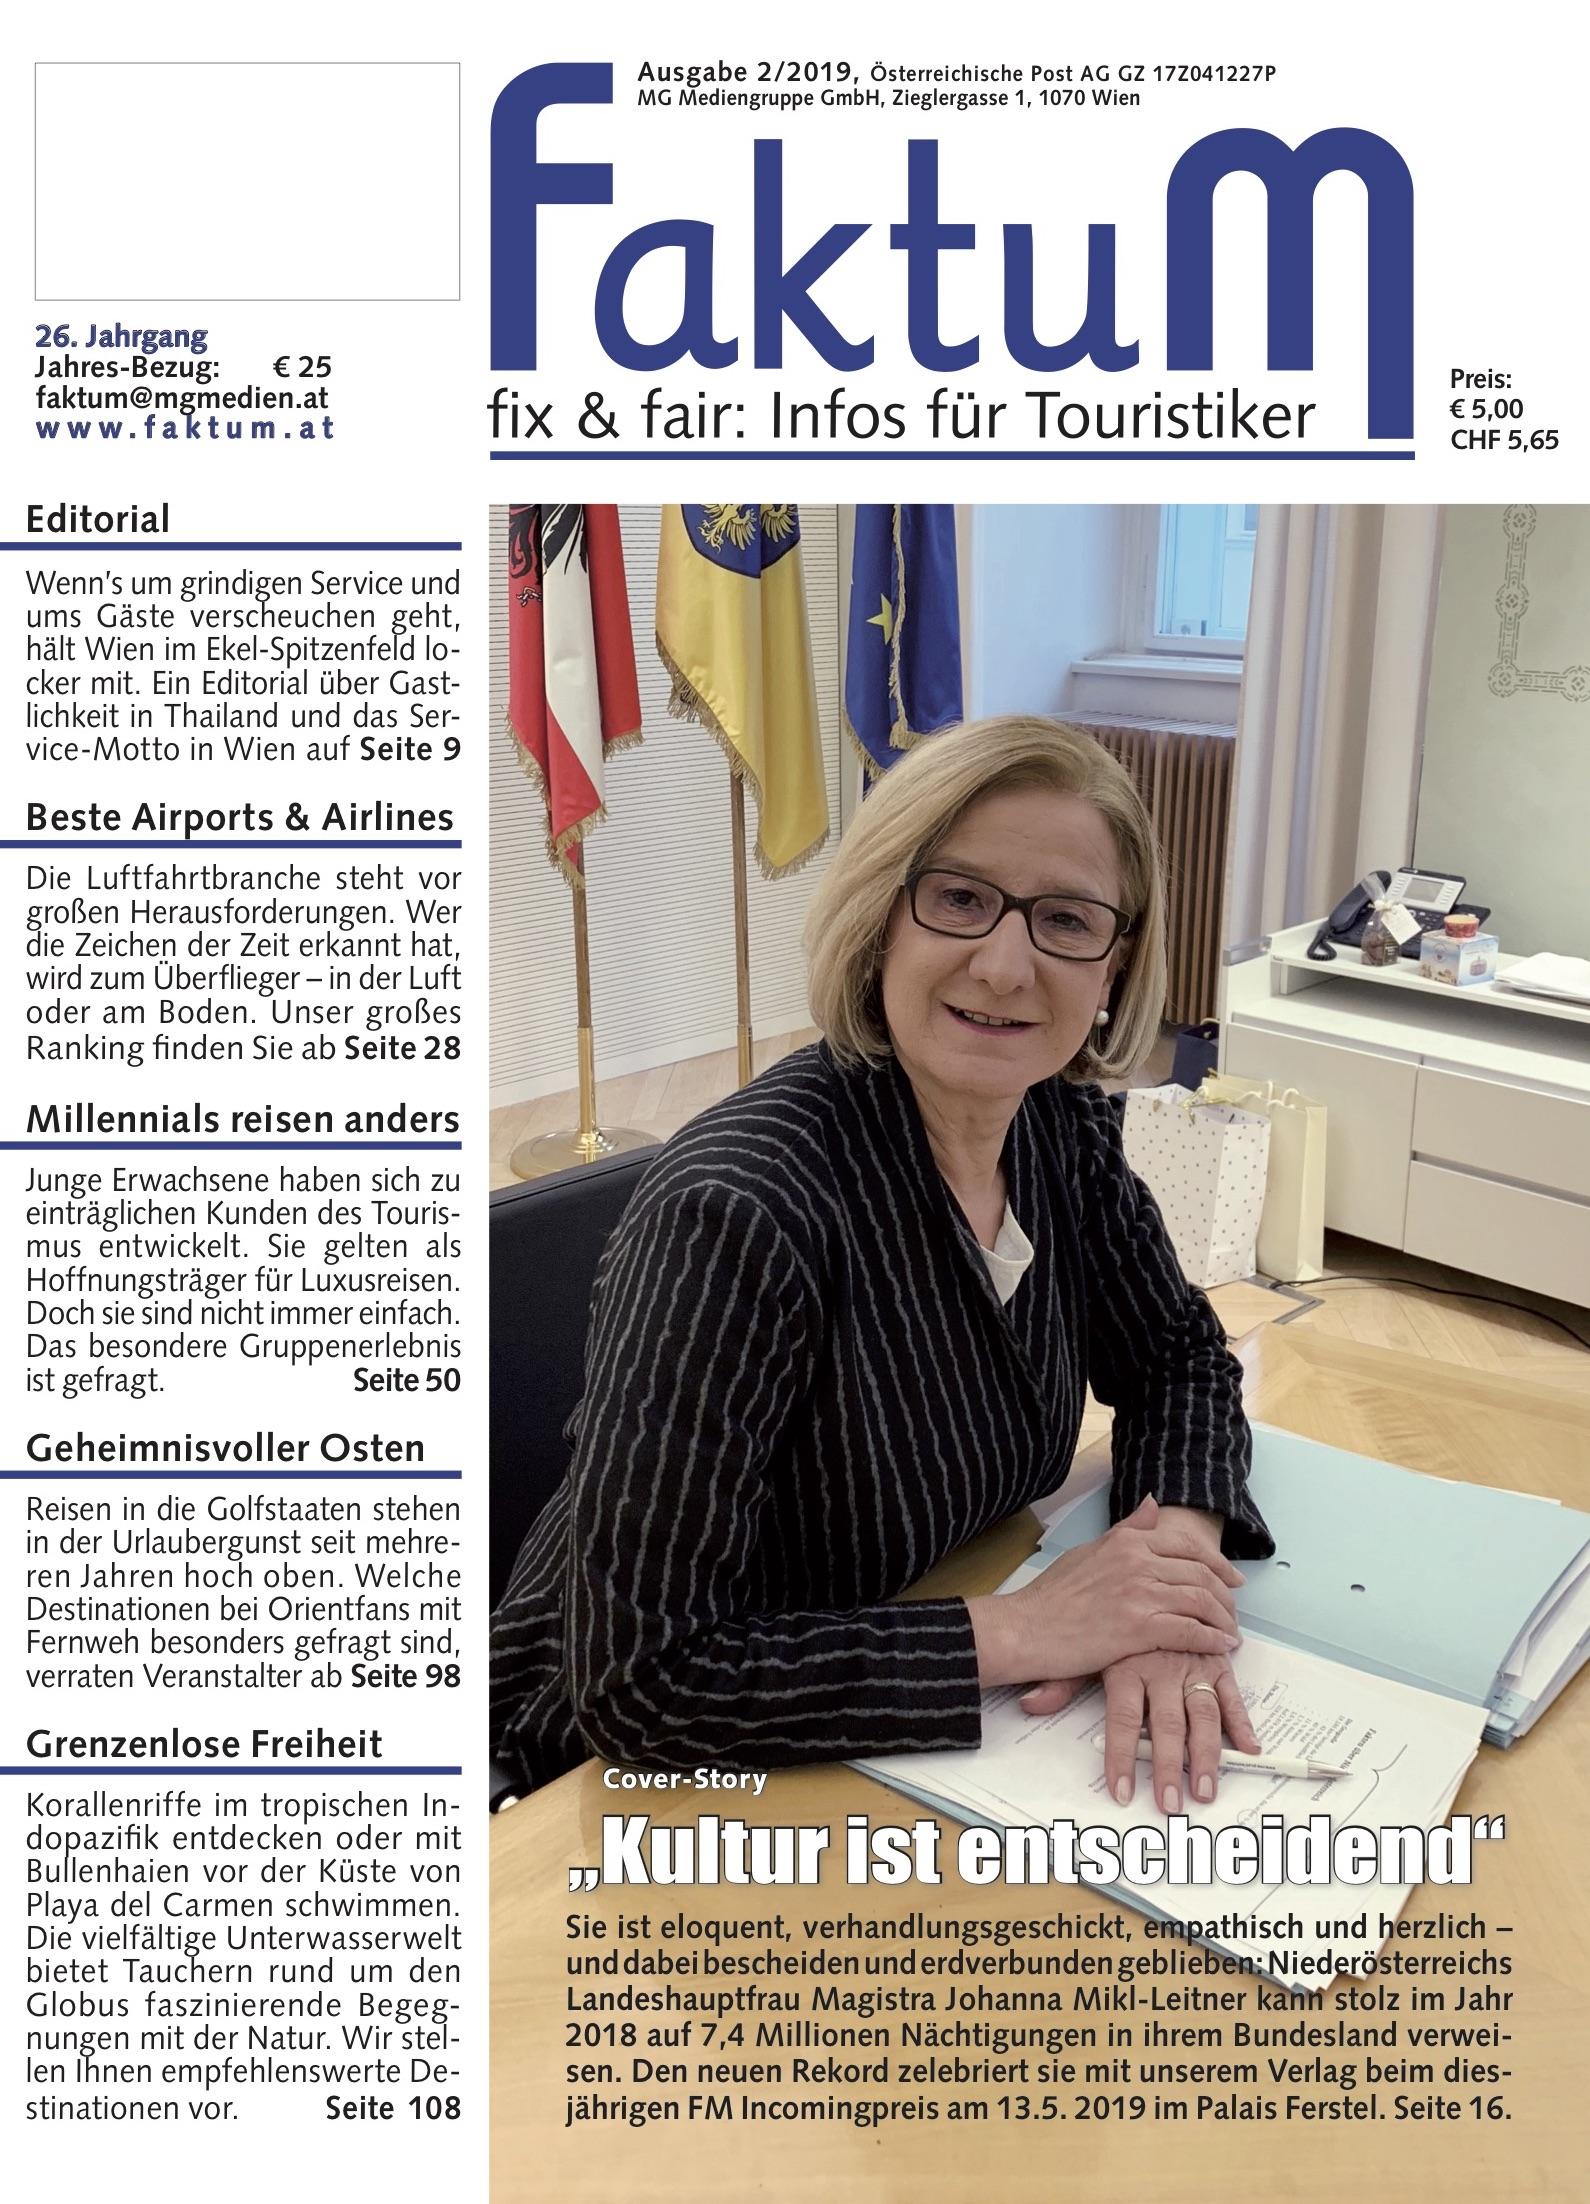 FaktuM 2/2019 Magazin Cover